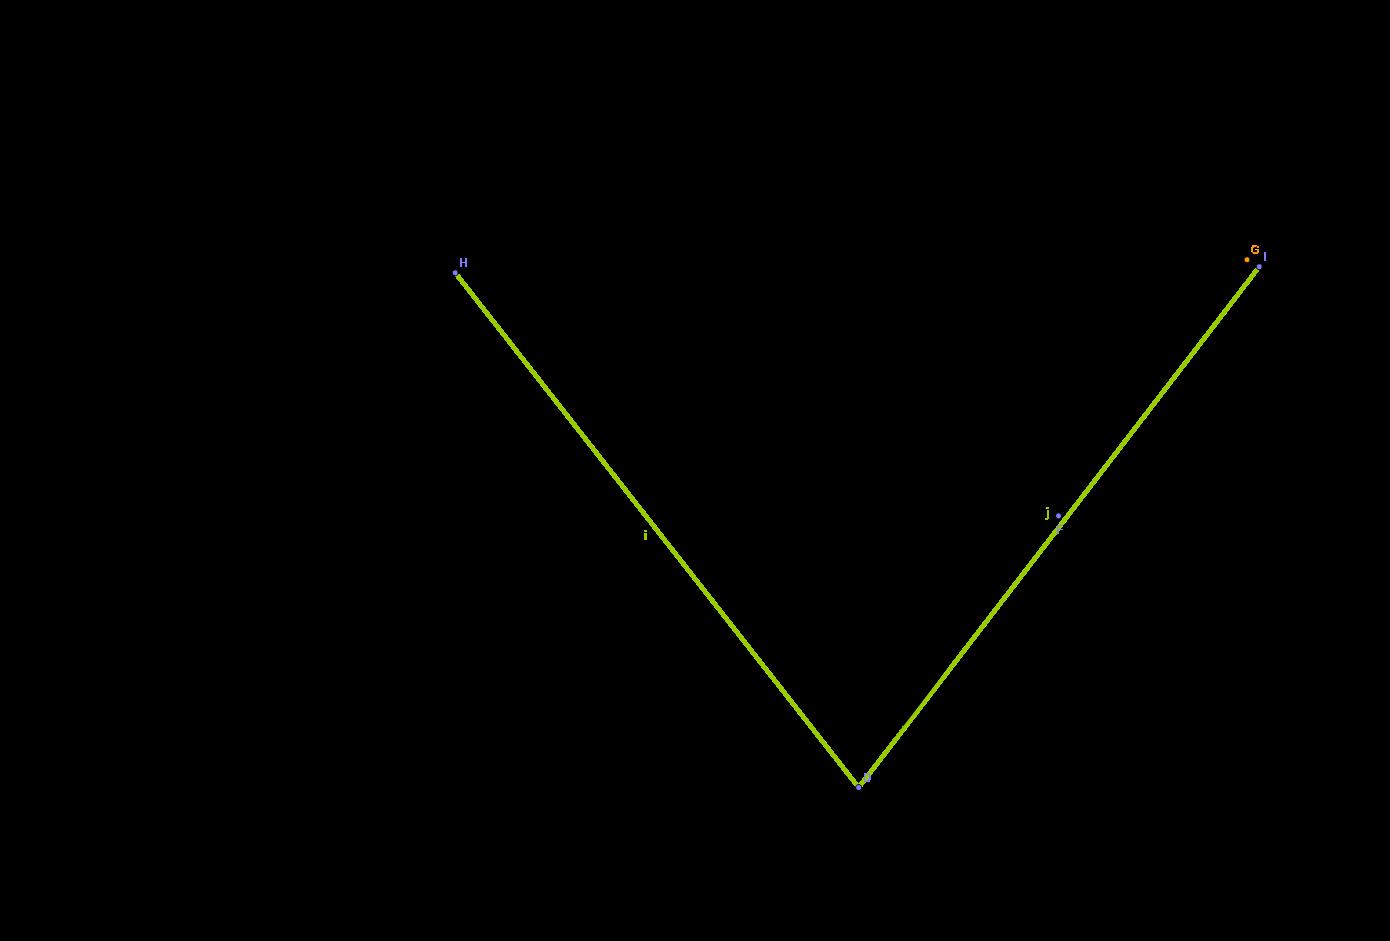 El mecanismo de brazo oscilatorio- Edward Gomez.